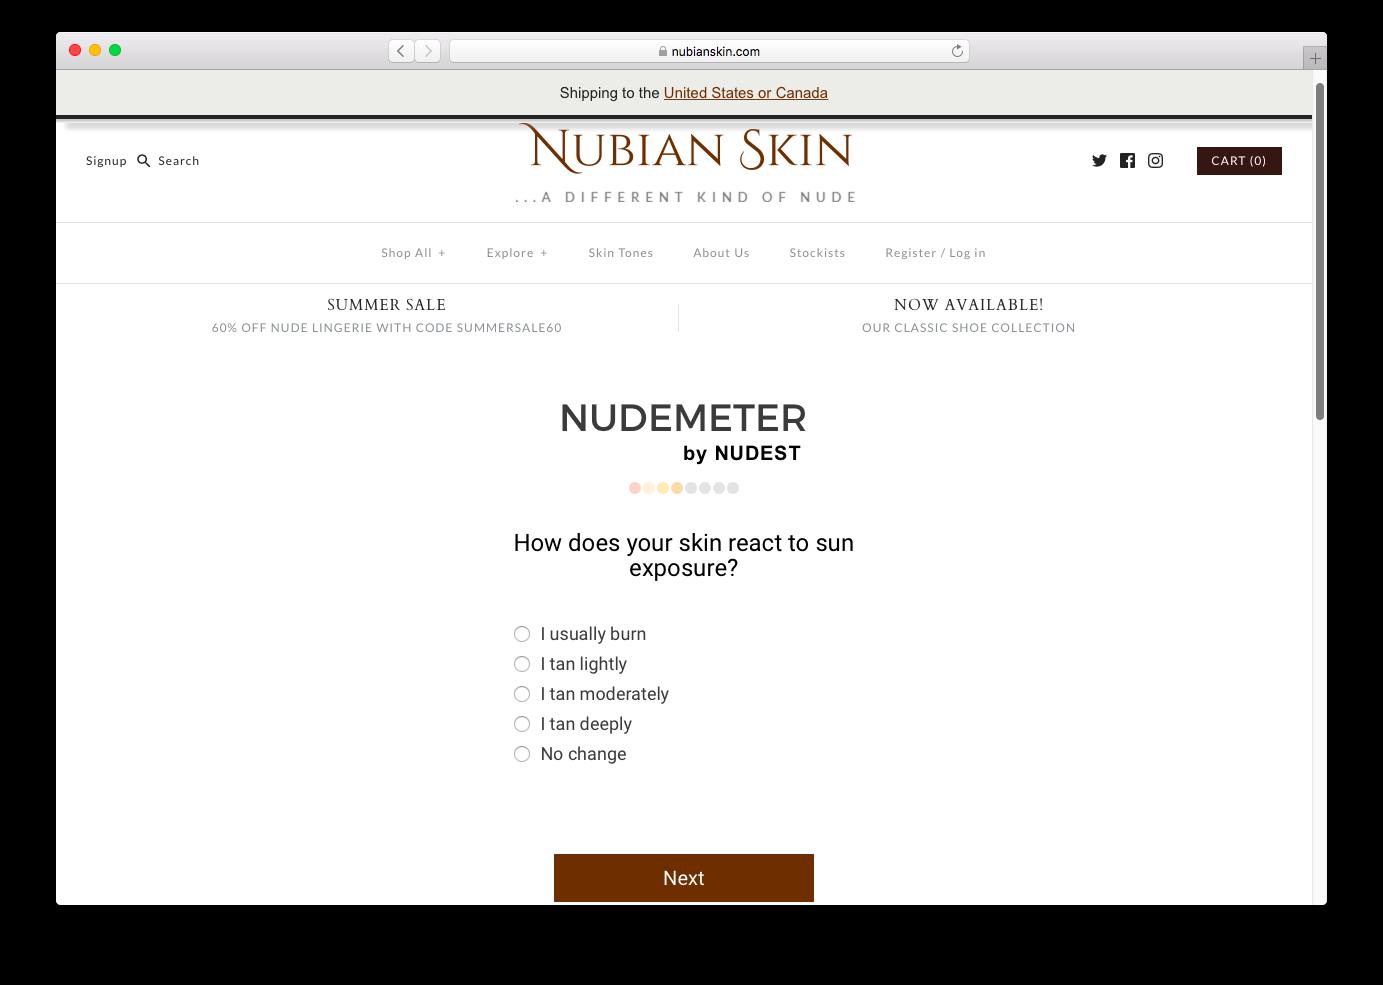 NUDEMETER at NubianSkin.com